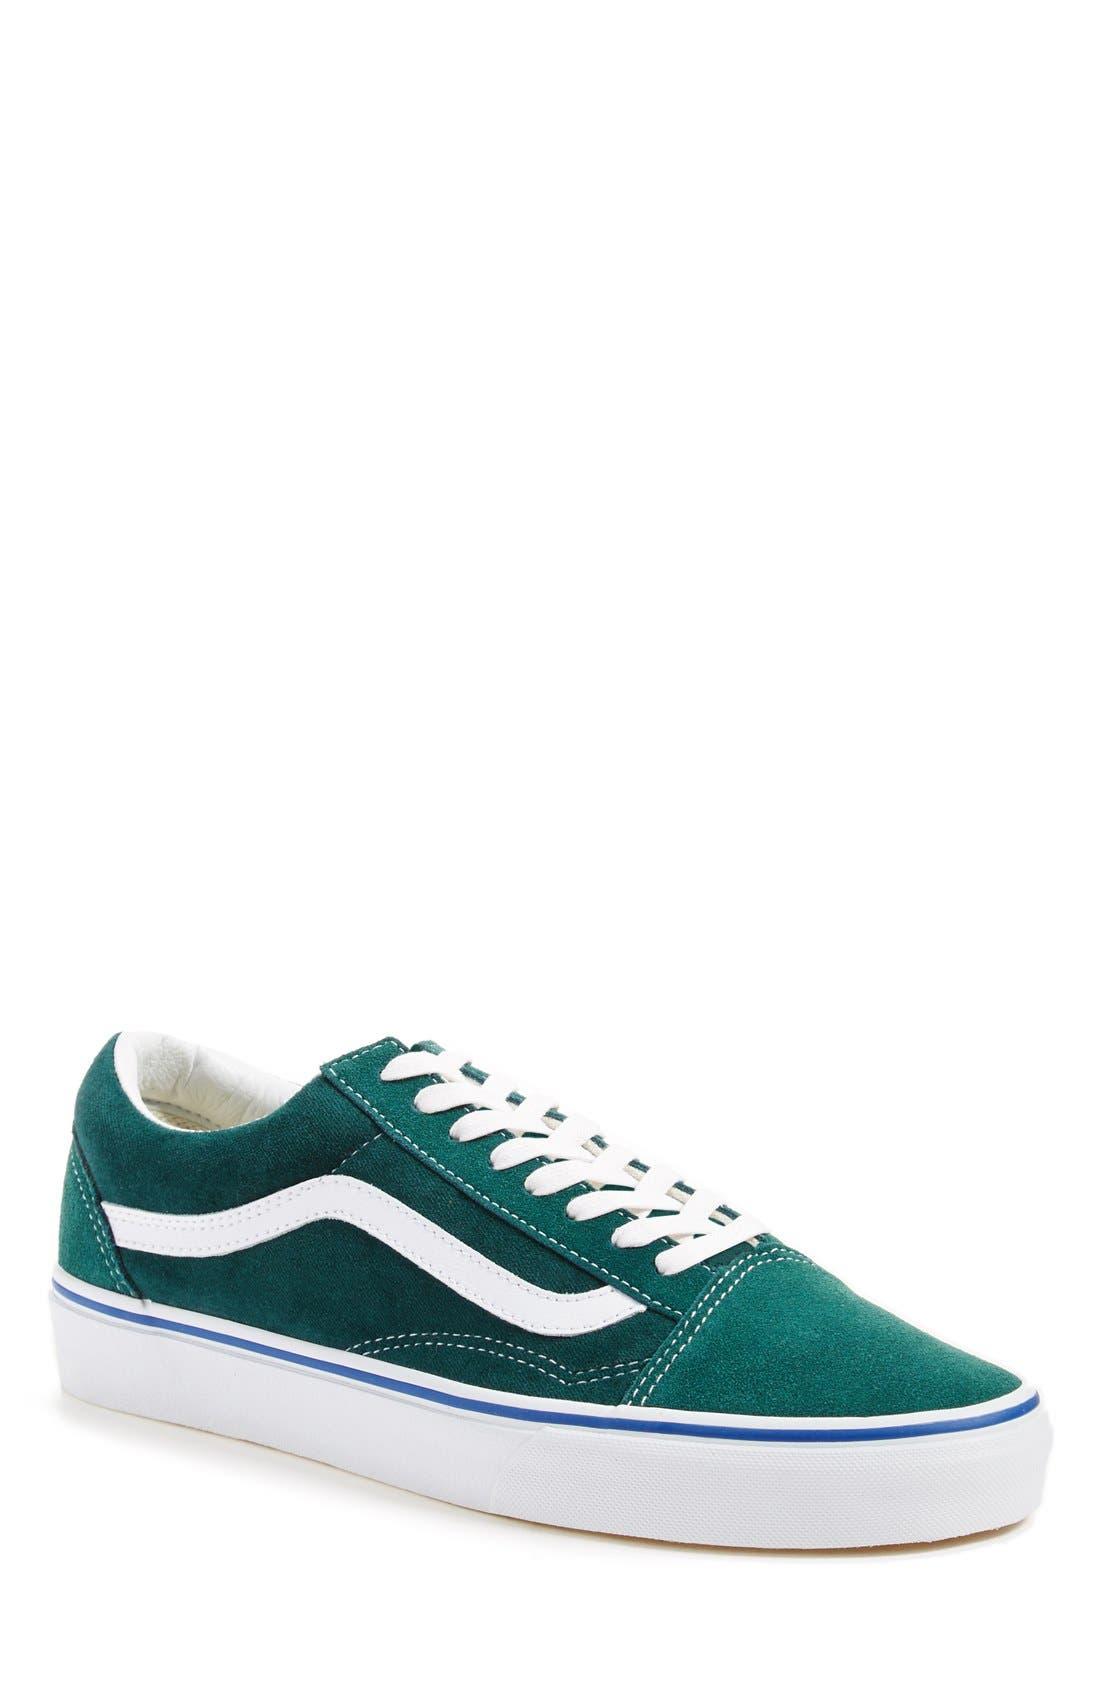 Alternate Image 2  - Vans 'Old Skool' Velvet Sneaker (Men) (Nordstrom Exclusive)